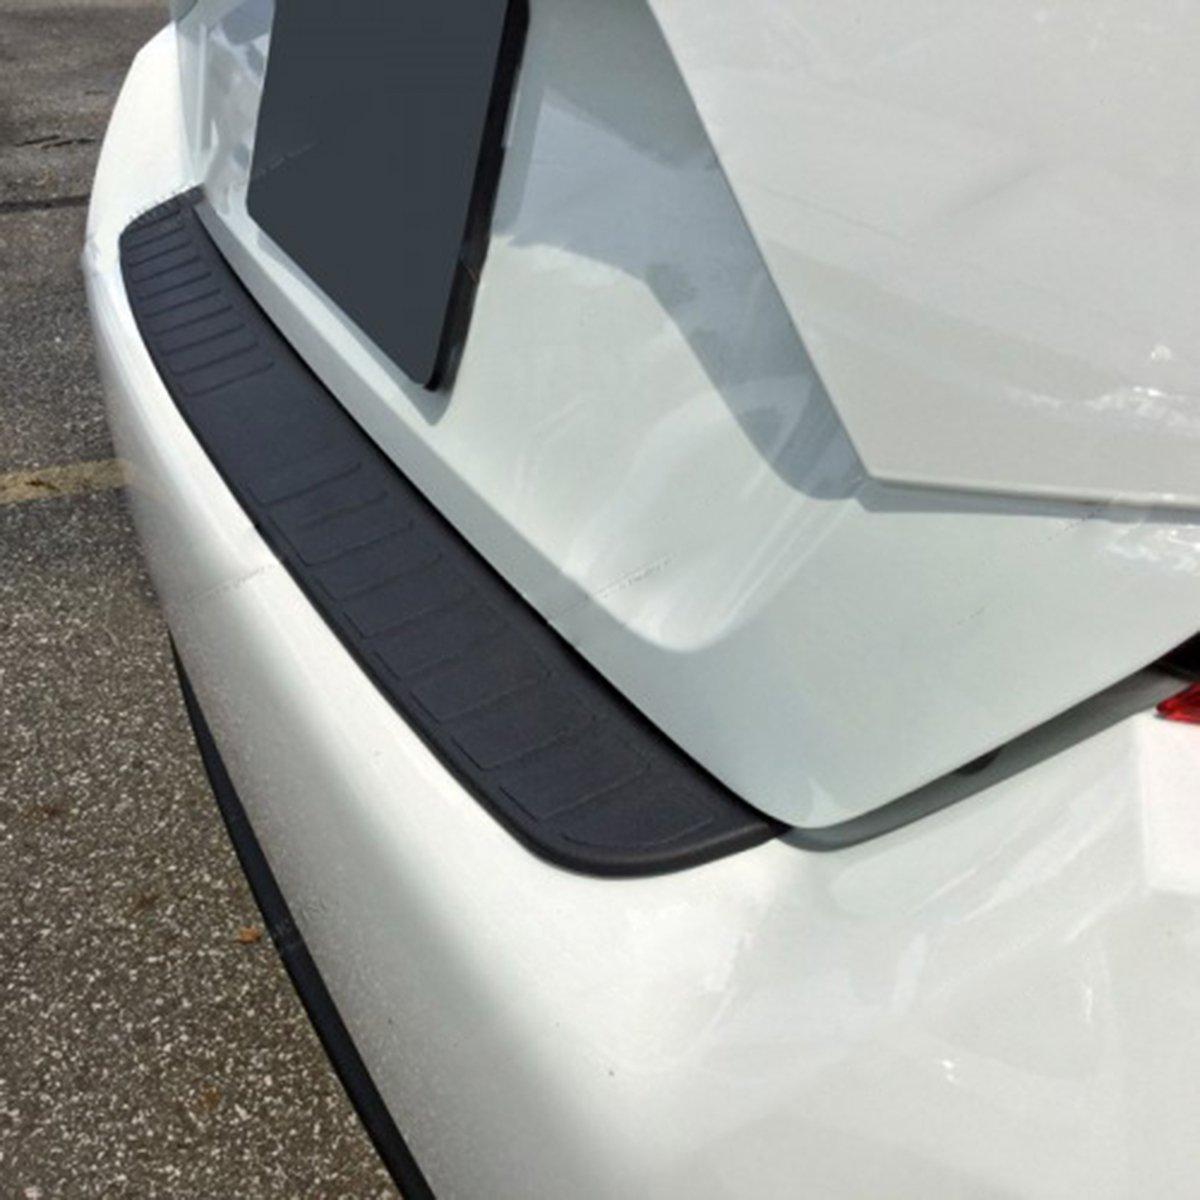 Rear Bumper Cover Protector for 2012-2016 Honda Civic Sedan